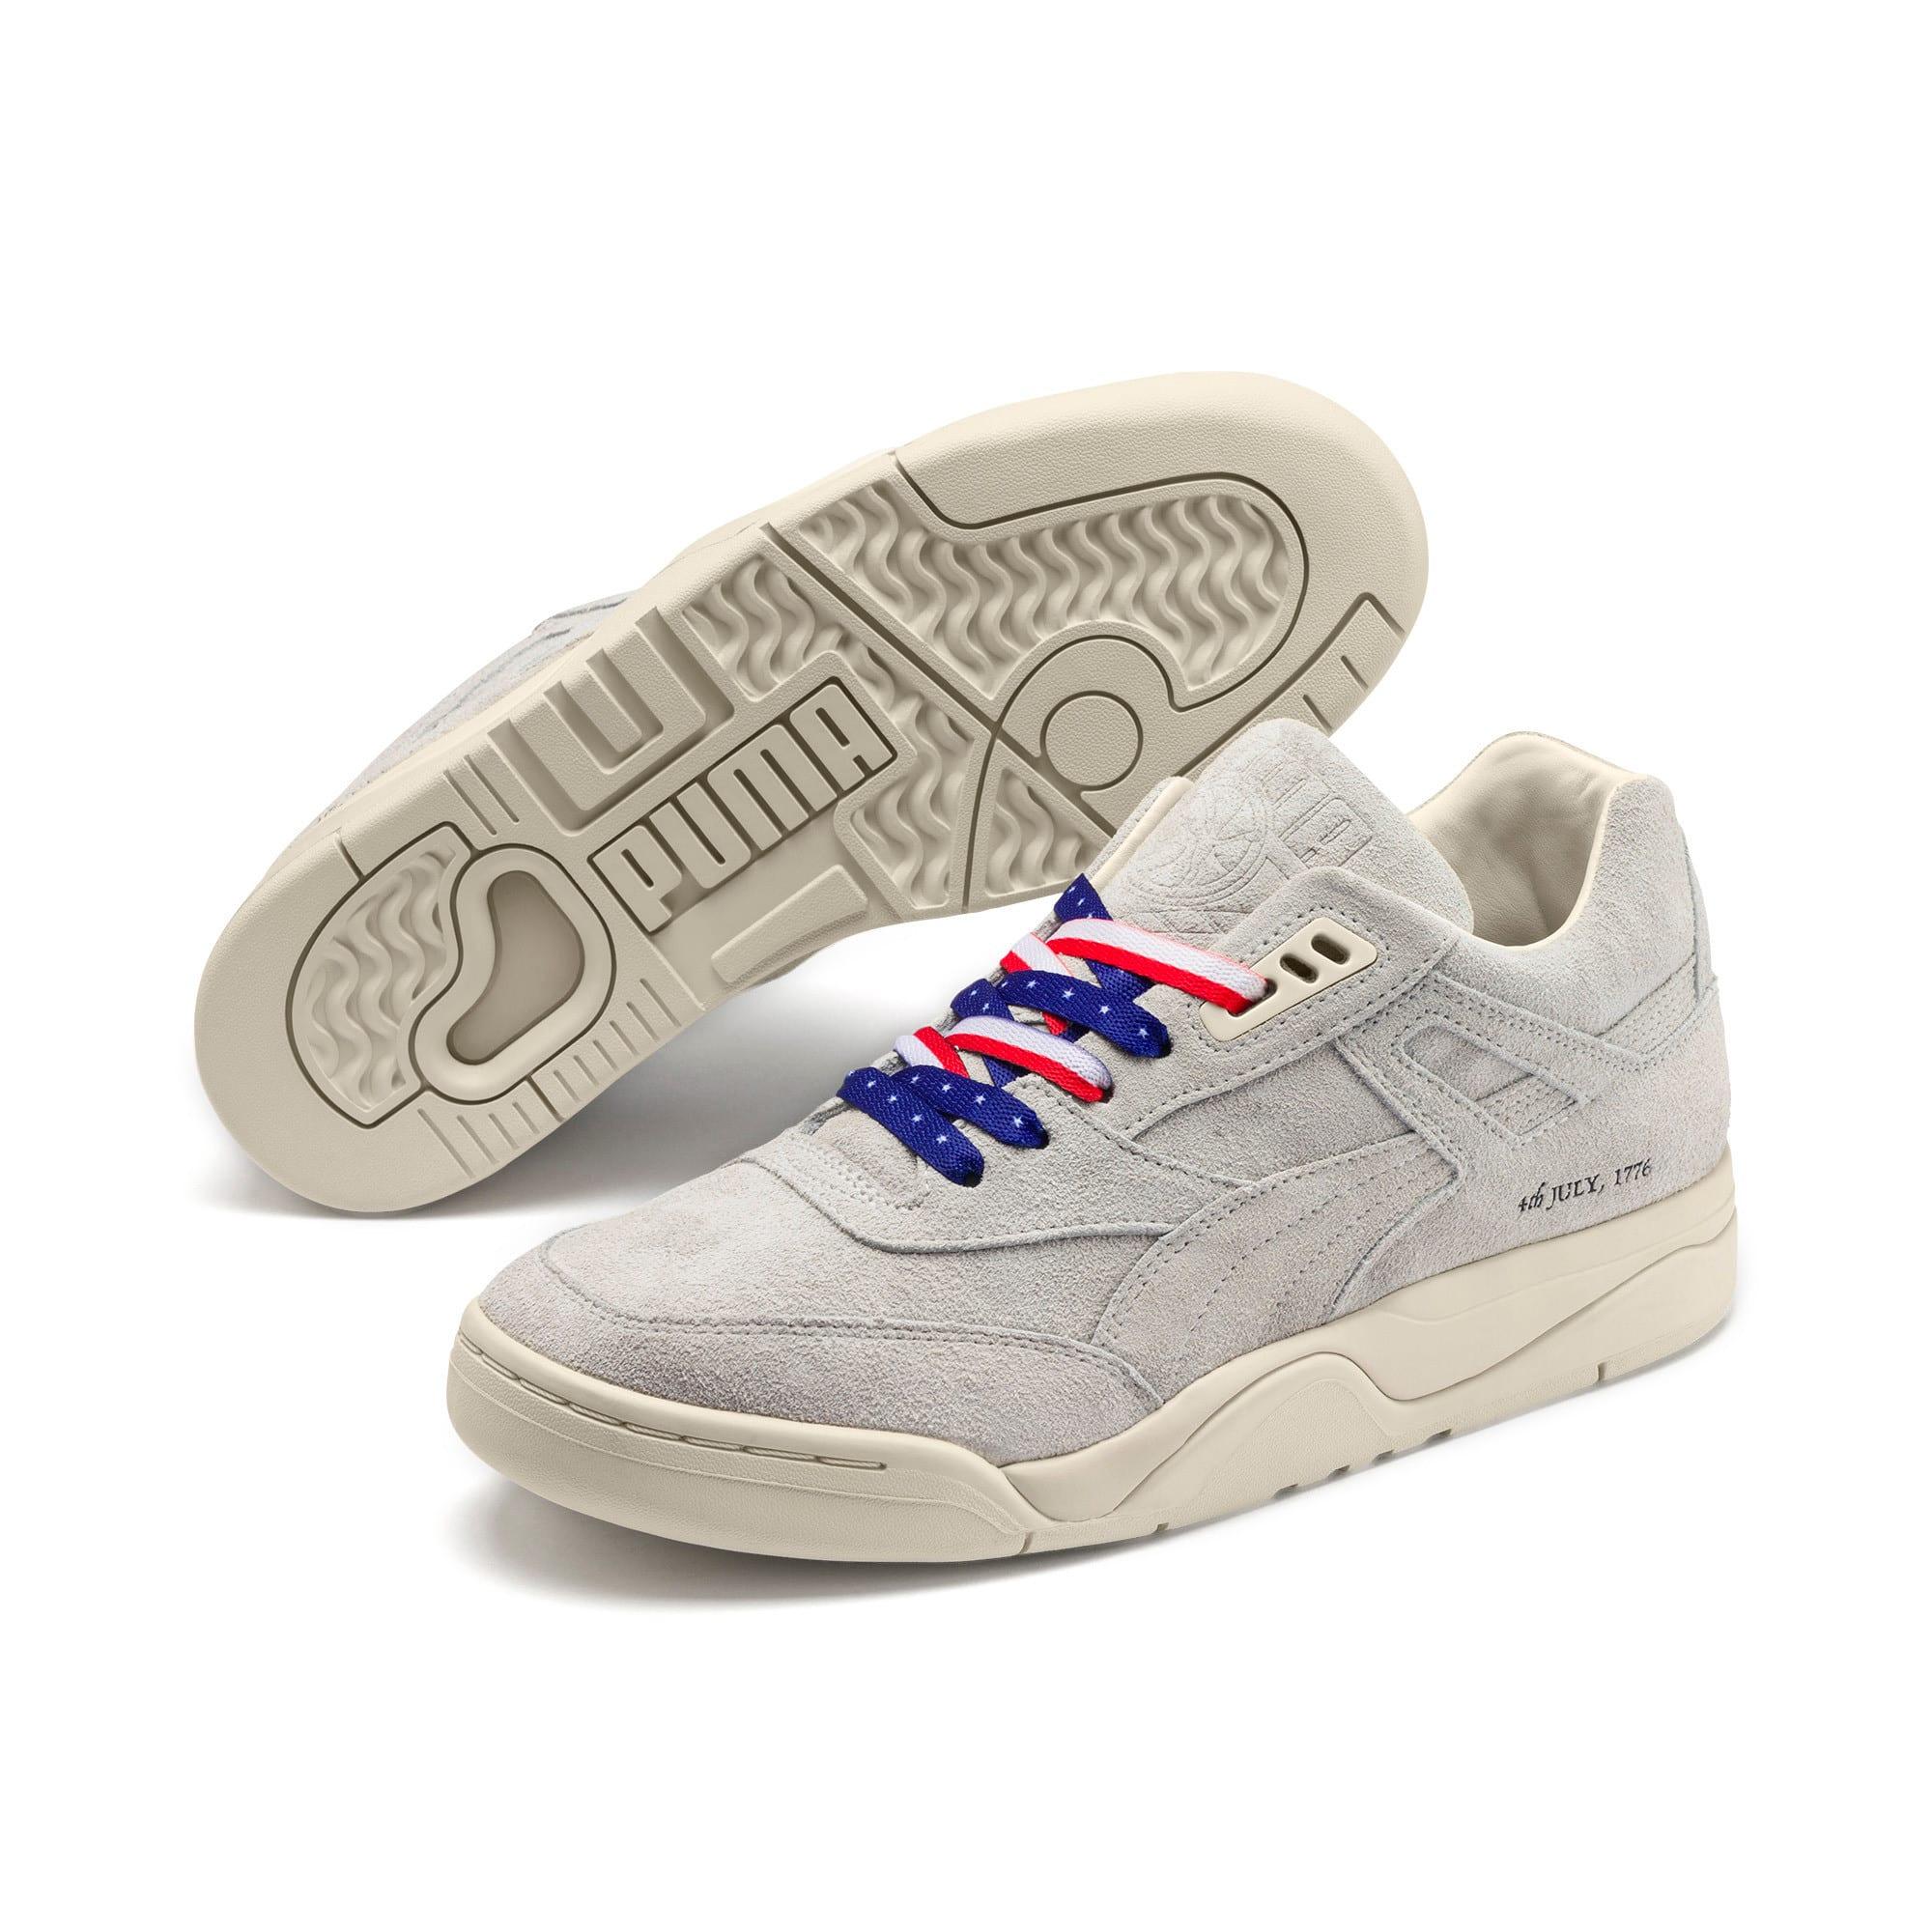 Thumbnail 7 of Palace Guard 4th of July Sneakers, Whisper White-Puma Black, medium